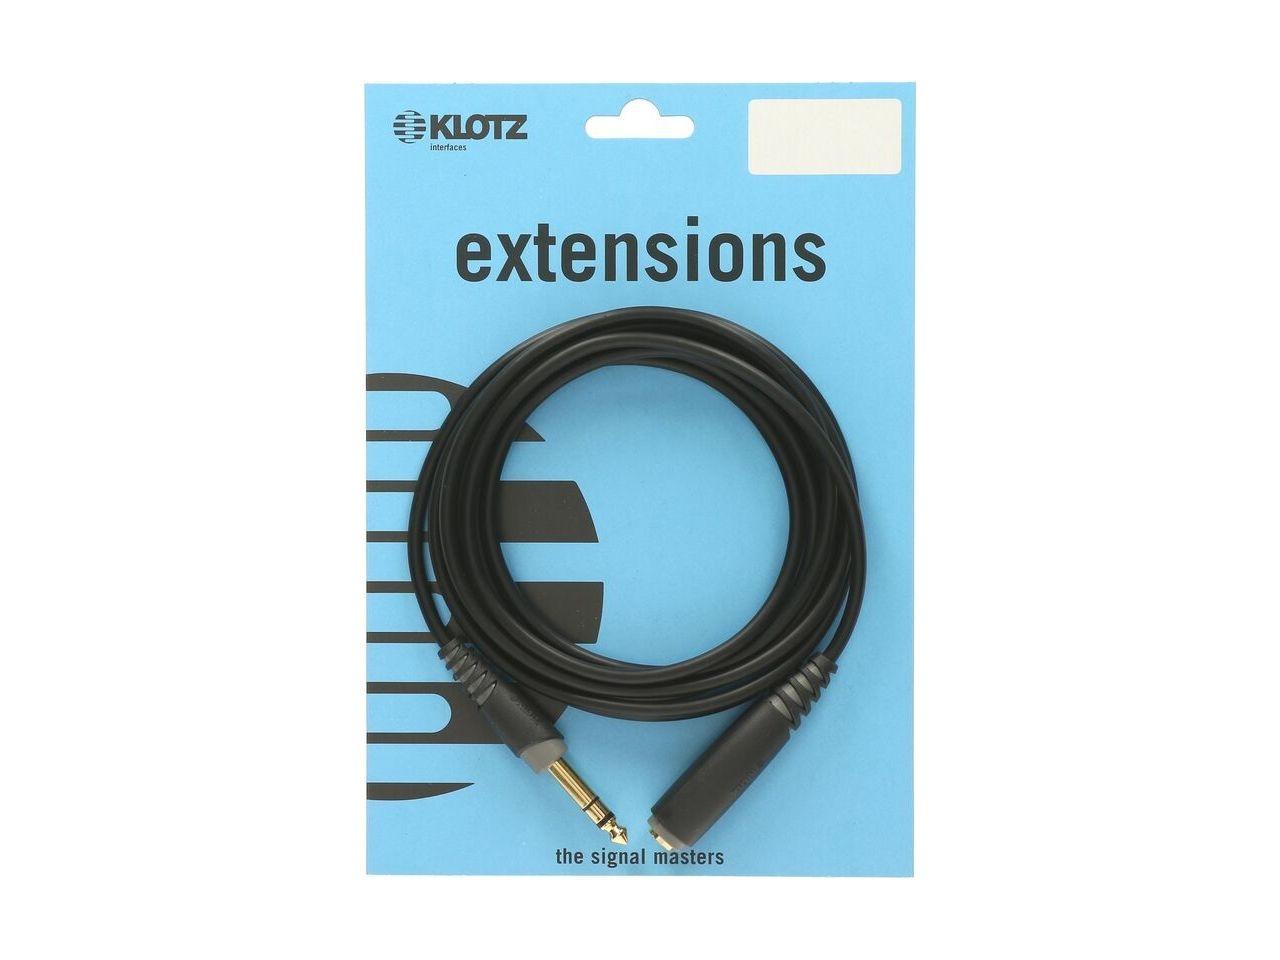 Klotz Kopfhörer-Verlängerung 6,3 mm Klinke stereo 3m